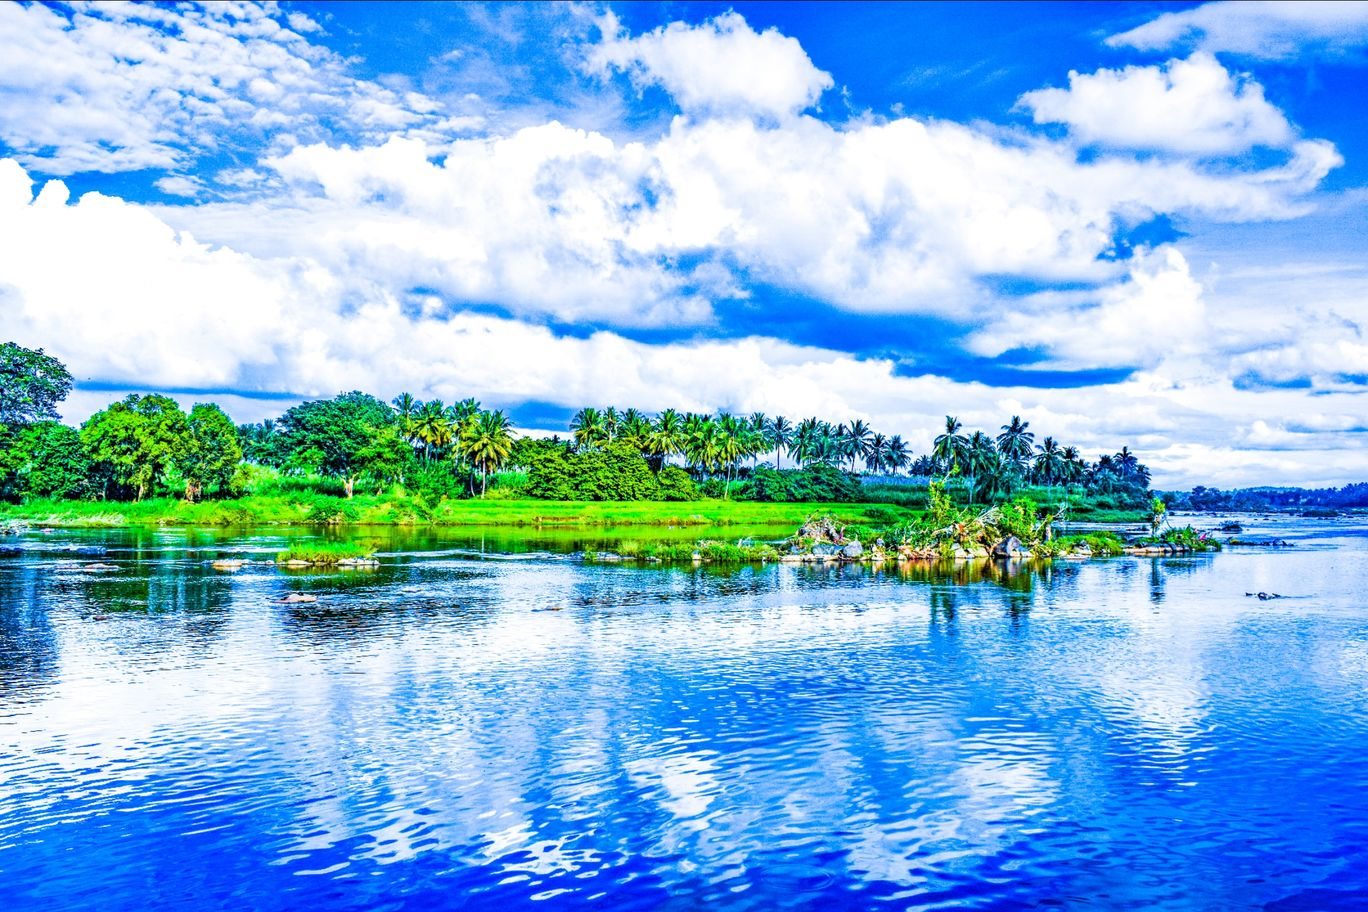 Photo of Triveni Sangama By mohan kumar